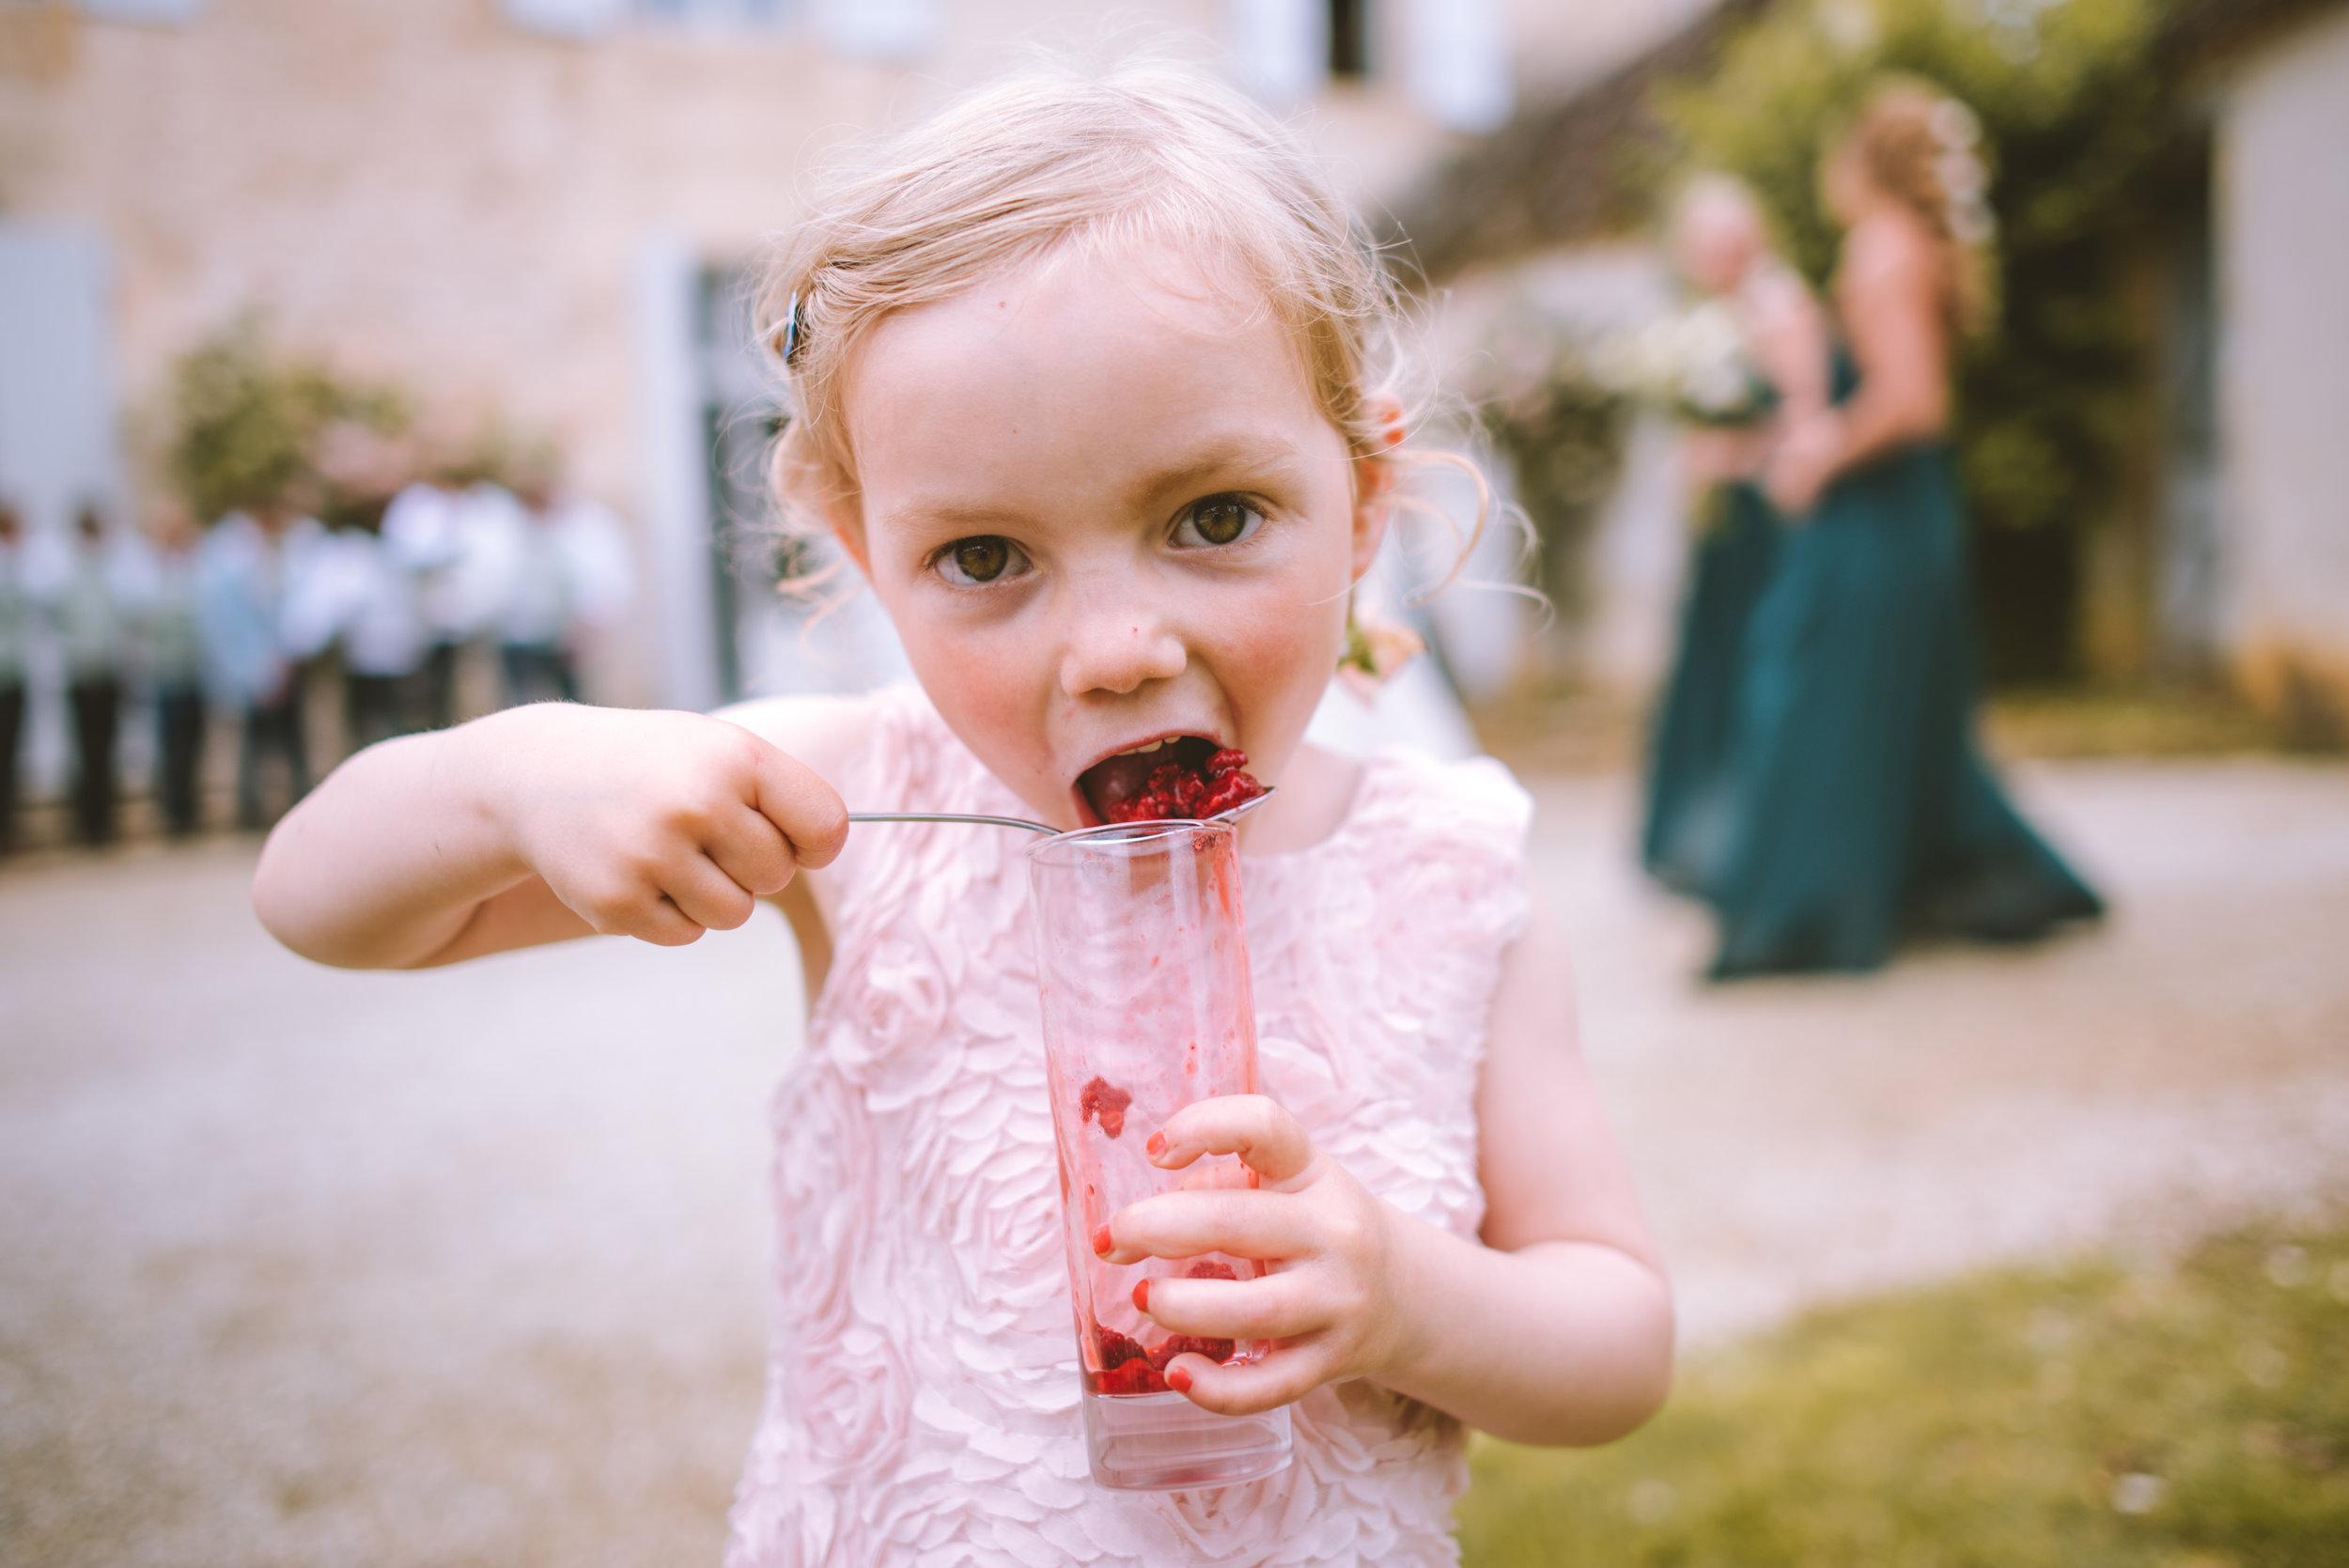 wedding-photographer-dordogne-mark-shaw-26.jpg